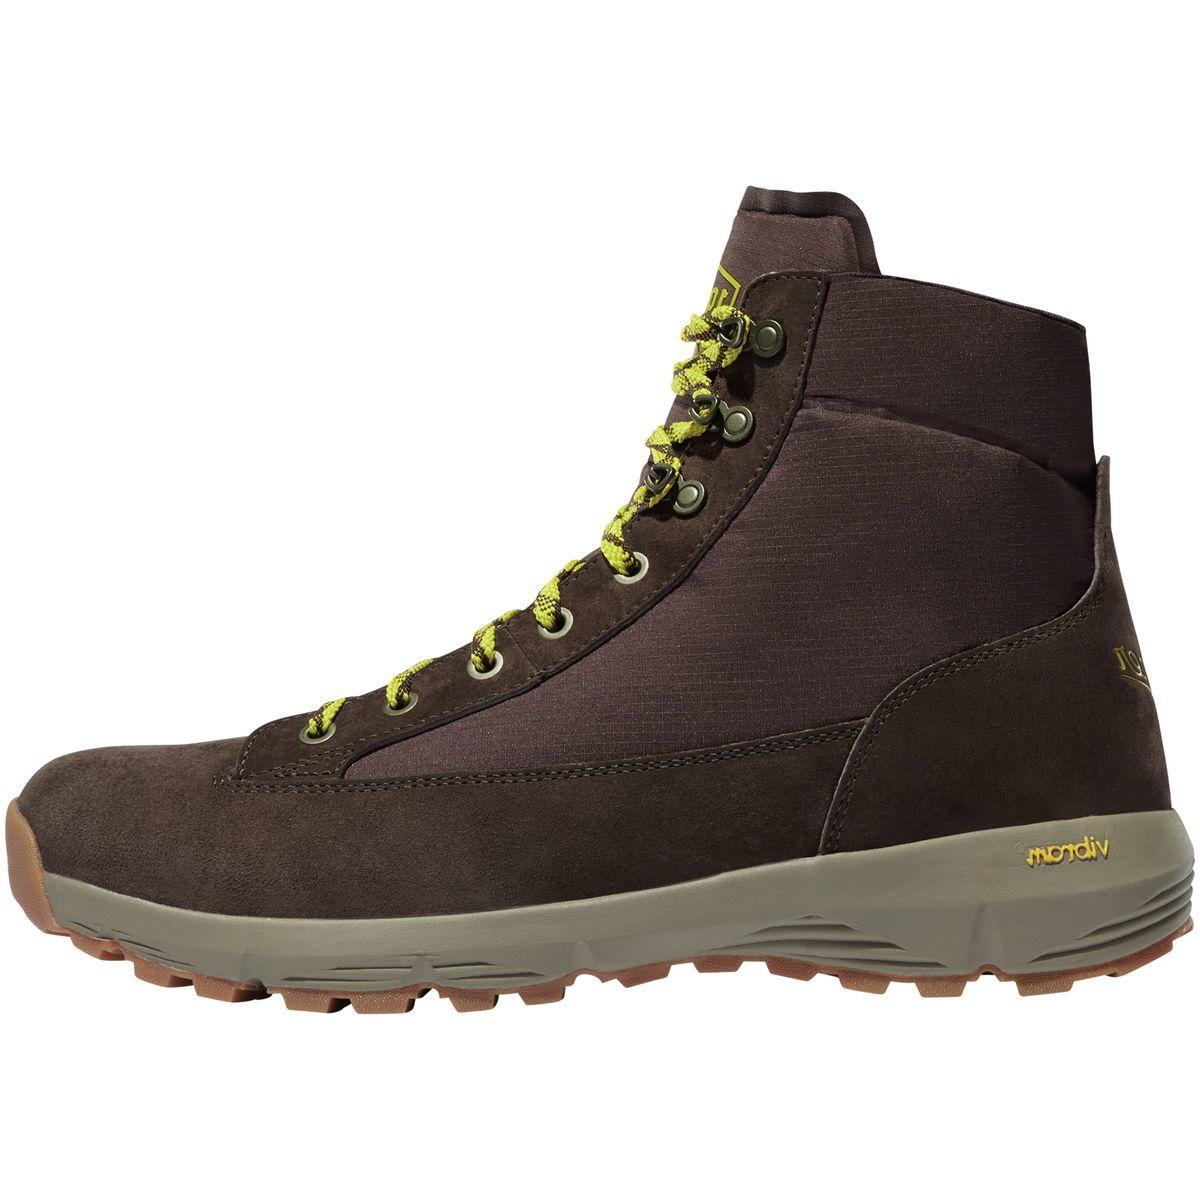 Danner Explorer 650 Hiking Boot - Men's